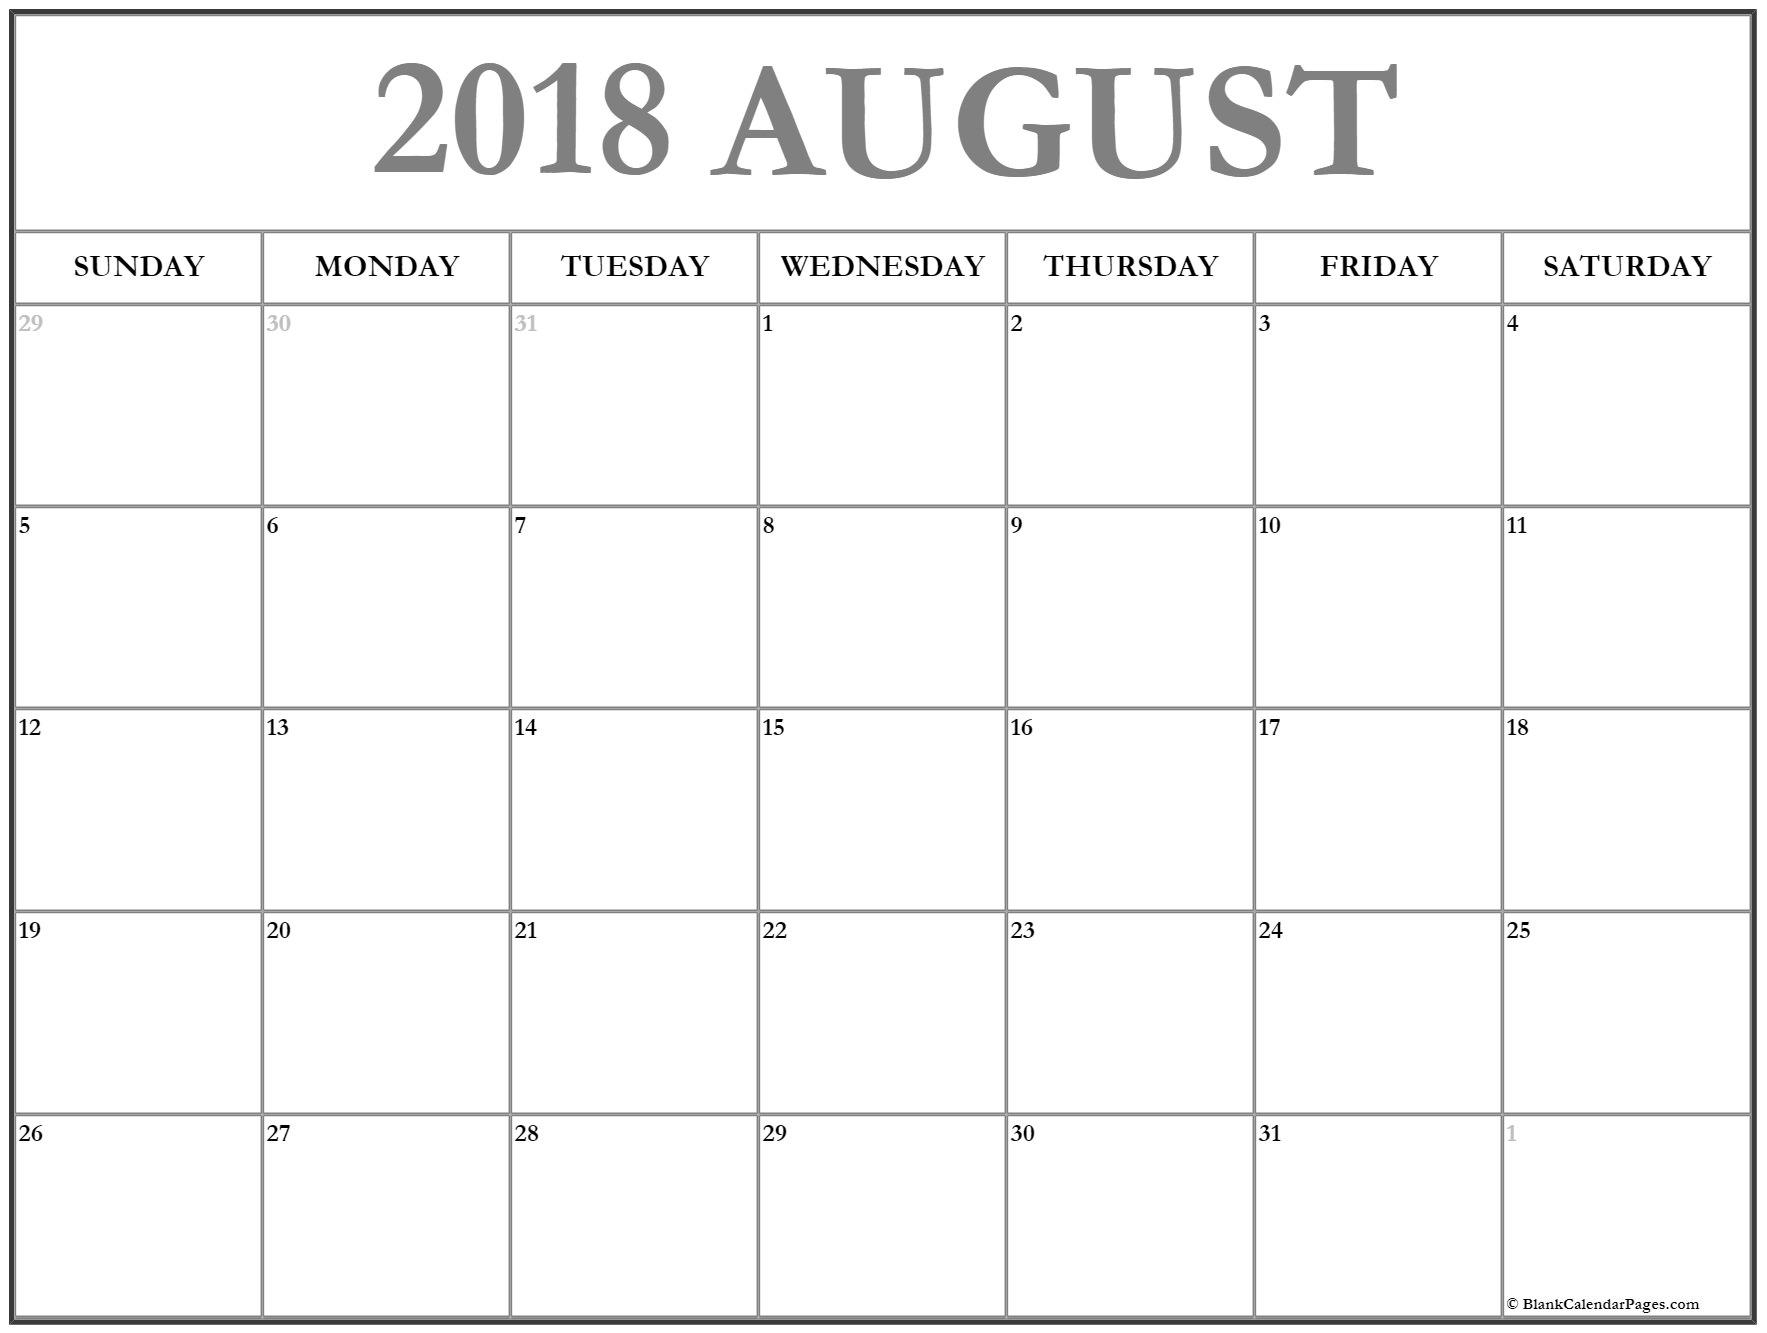 2018 August Calendar South Africa